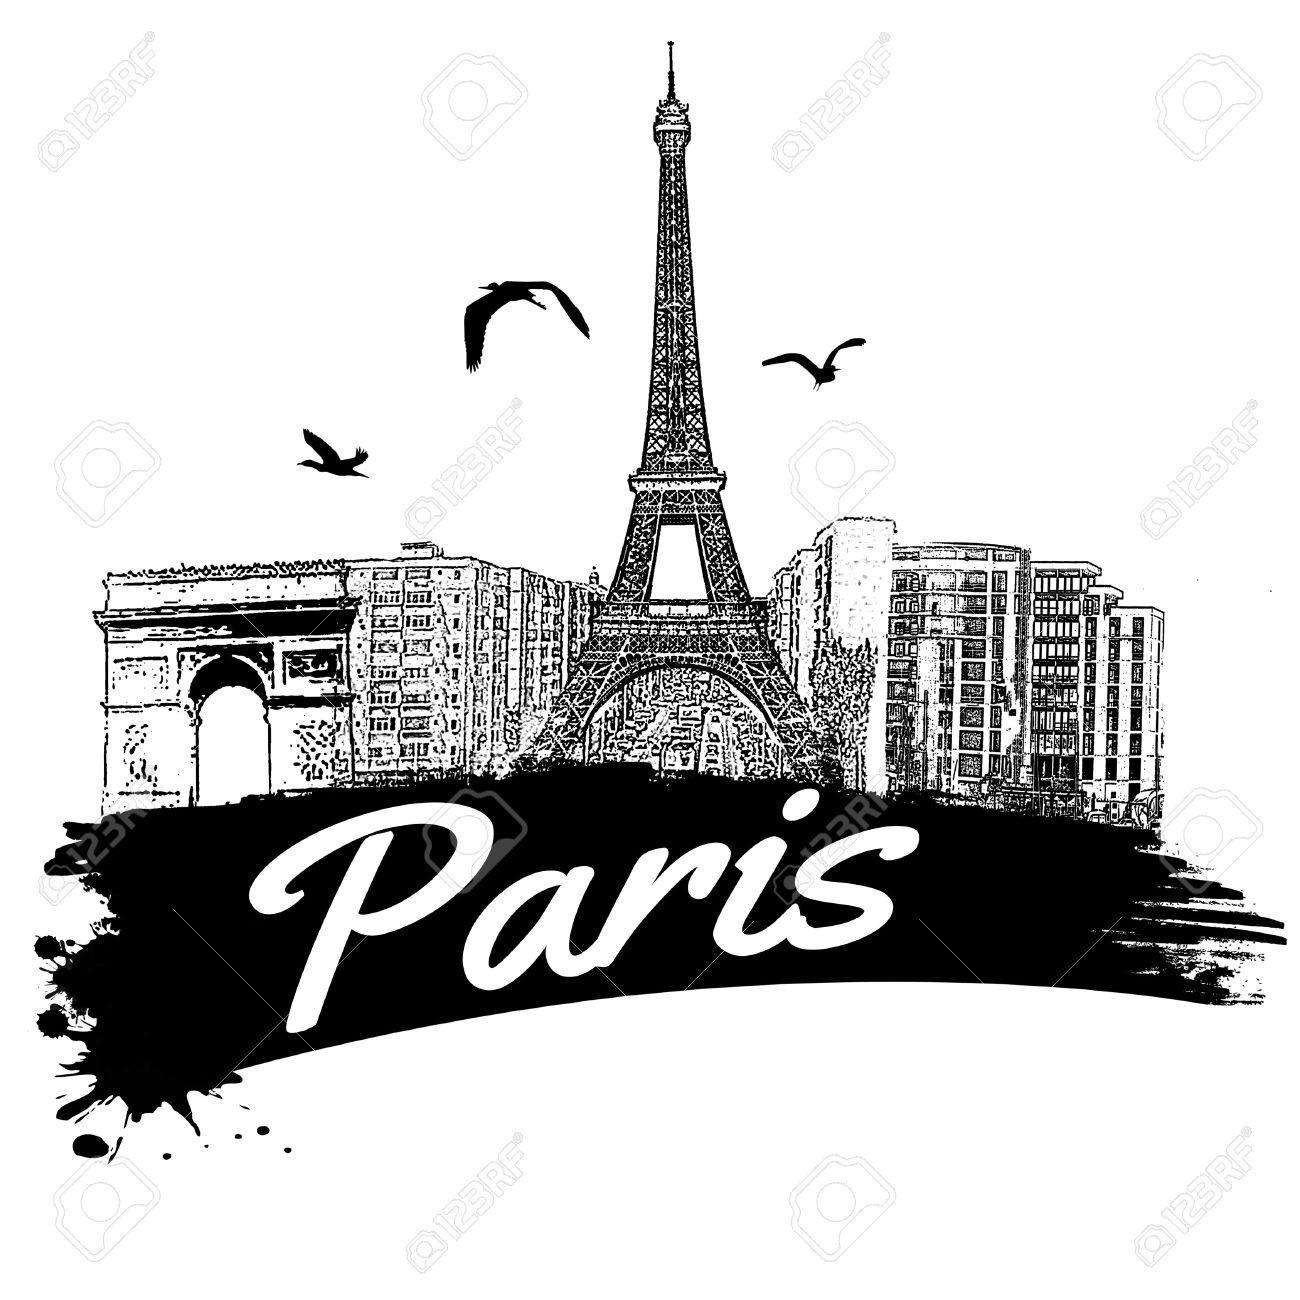 Paris Illustration: 24028467-Paris-in-vintage-style-poster-vector-illustration